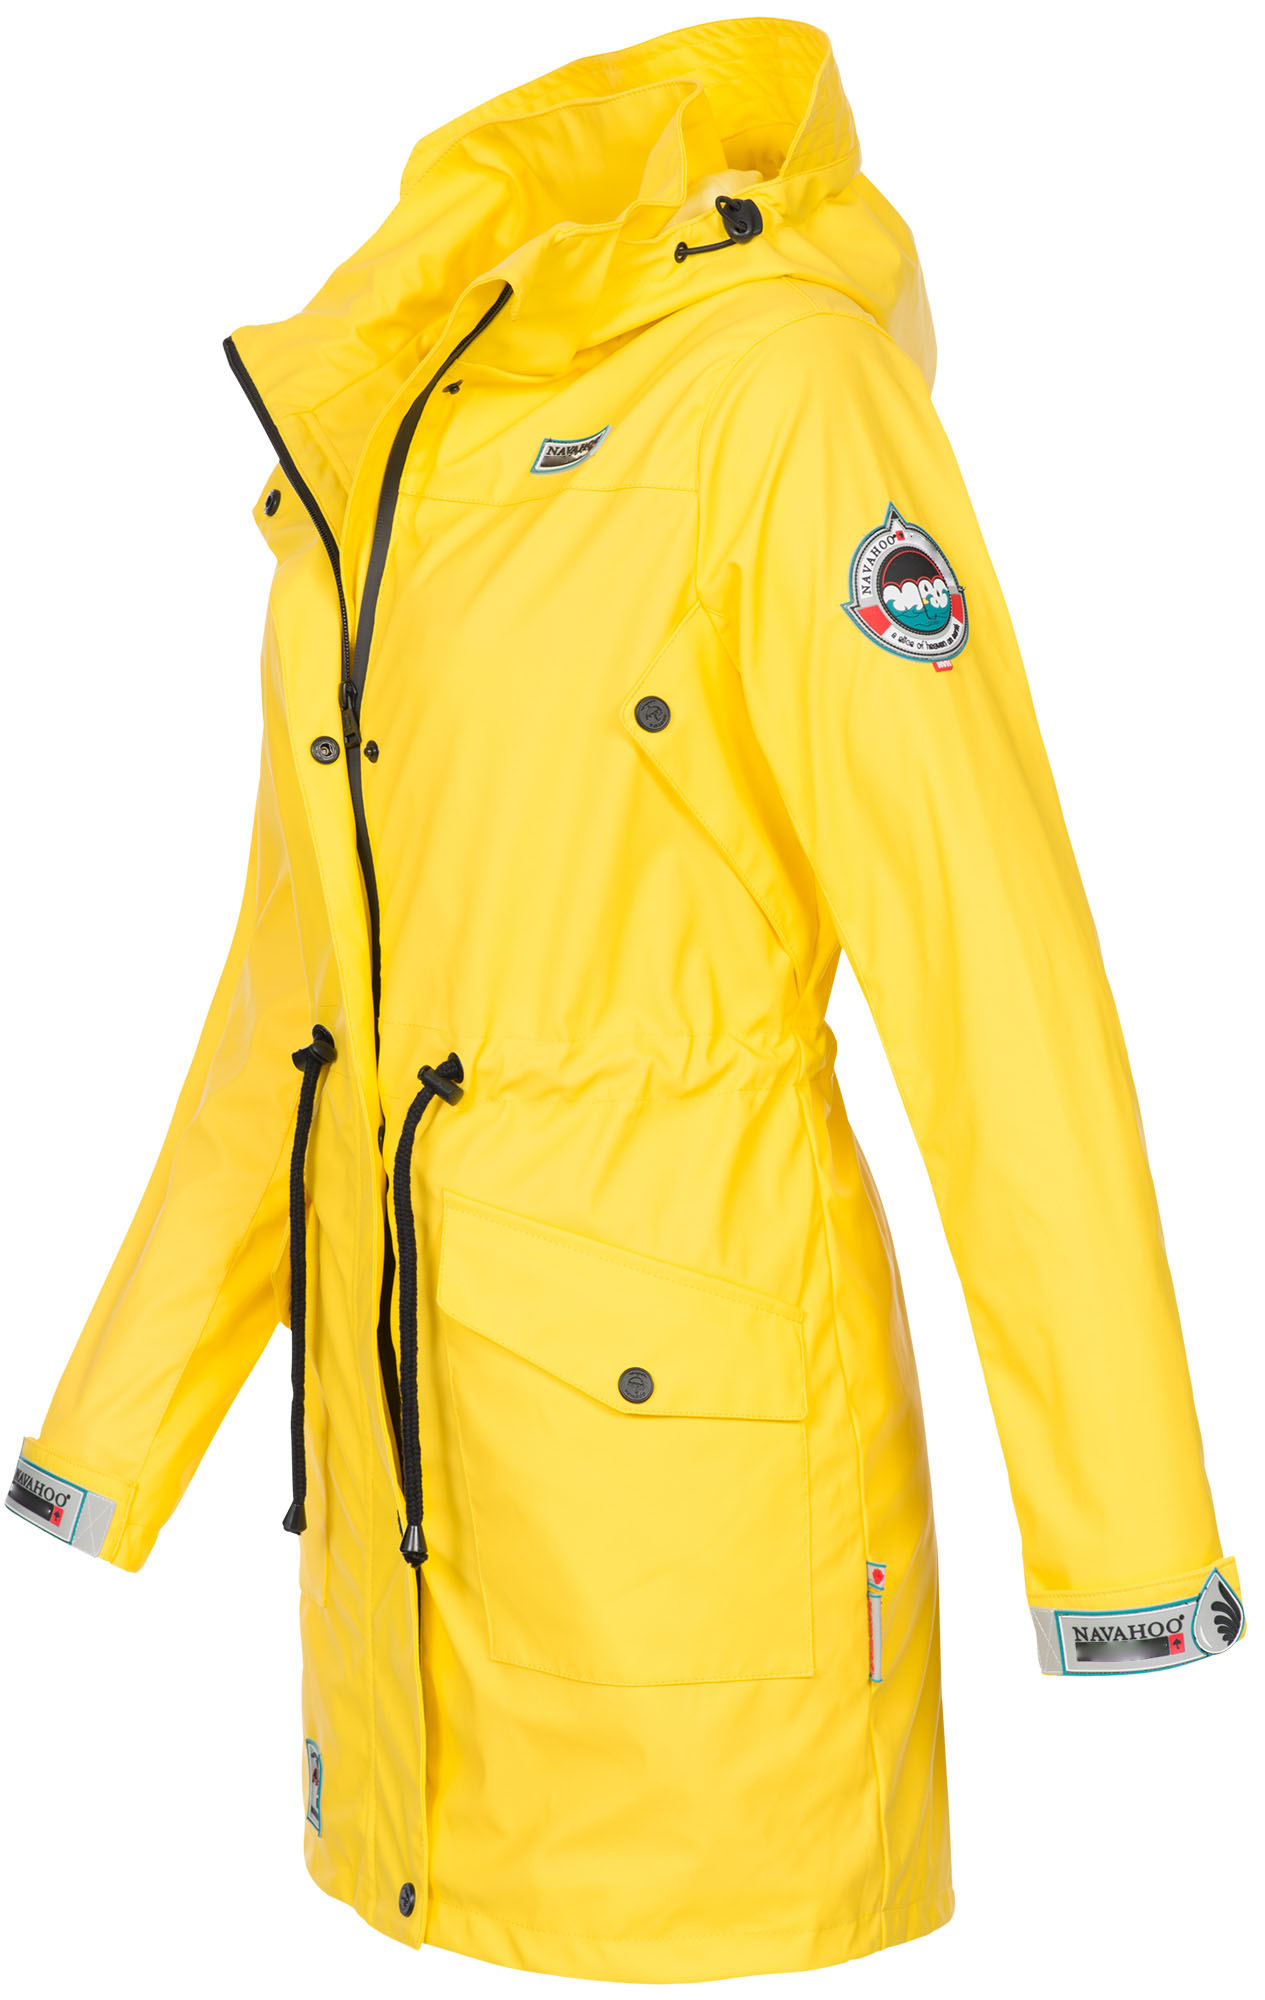 Navahoo Damen Regenjacke Regenmantel lang Teddyfell Jacke Mantel Kapuze B678 NEU